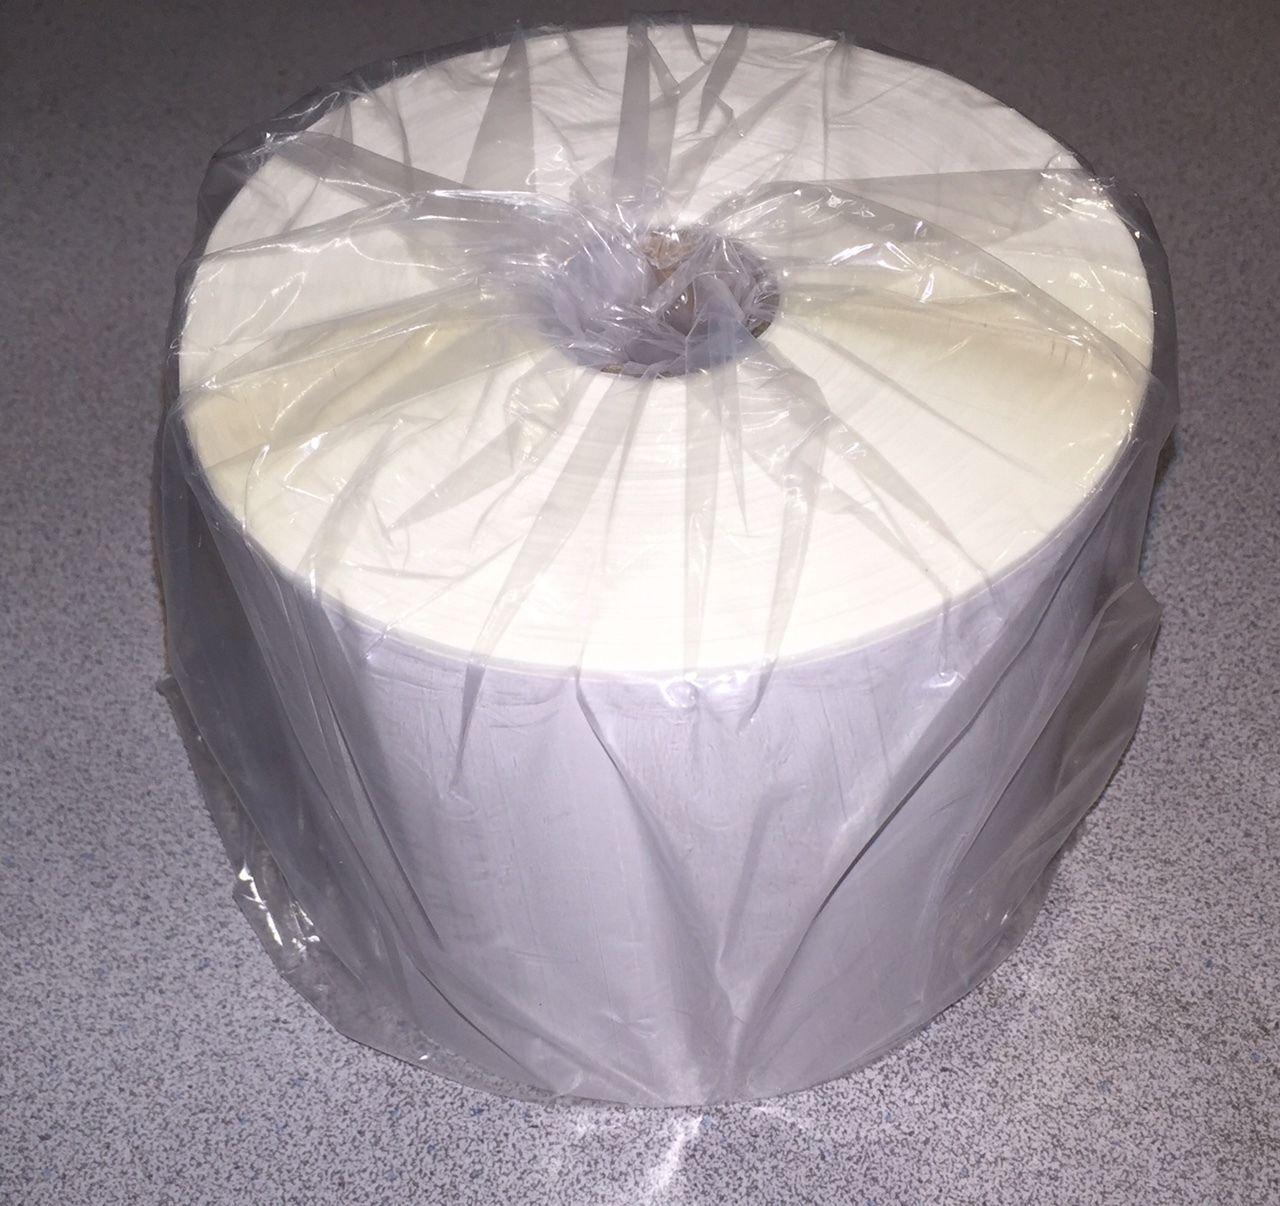 4 Rolls 500 4x6 Direct Thermal Labels/Free Shipping Zebra LP 2844, ZP,450, GoDex